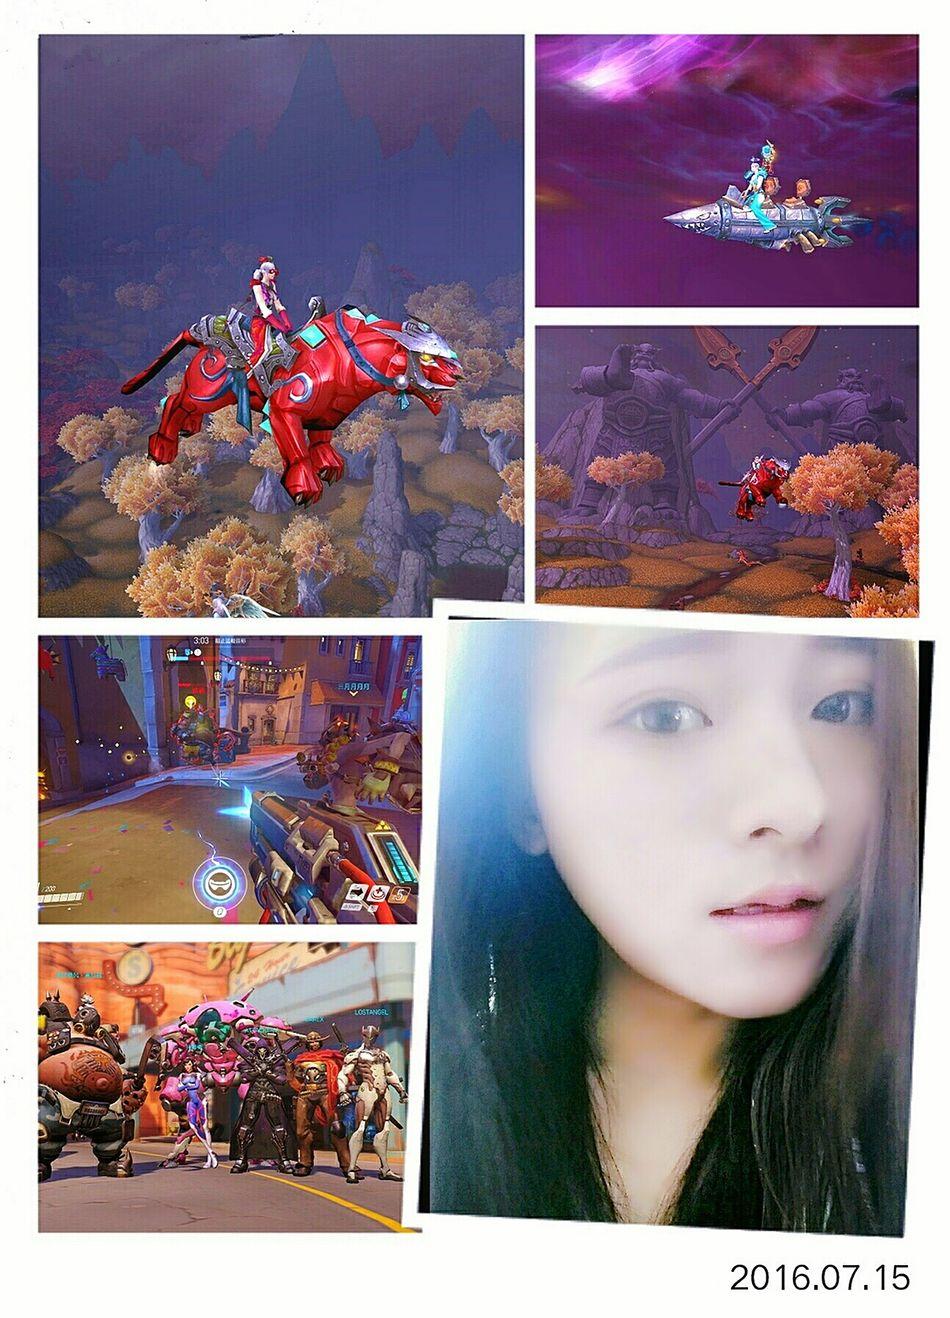 Game Time  Playing Games Game Games Onlinegame Rpg Rpggame RPGの世界 ゲーム Overwatch Warcraft Hi! That's Me Me Selfie Selfies Collage